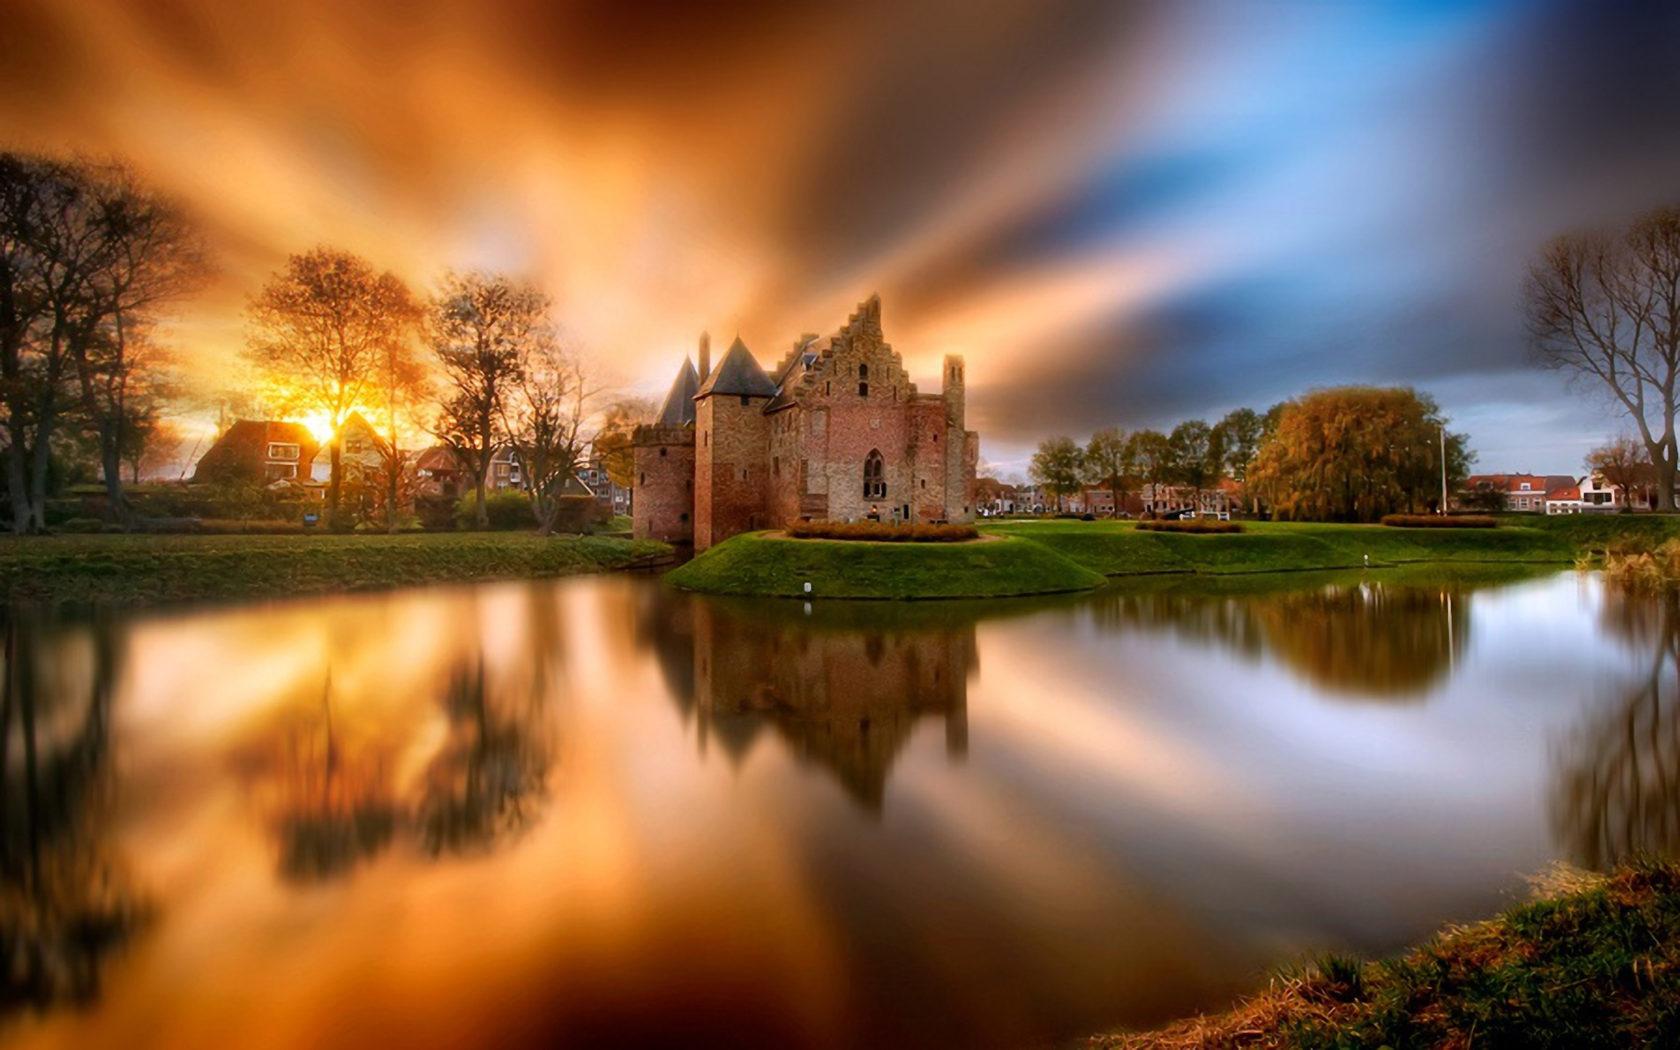 Cool Cars As Wallpaper Castle Lake Sunset Netherlands Hd Wallpaper Wallpapers13 Com